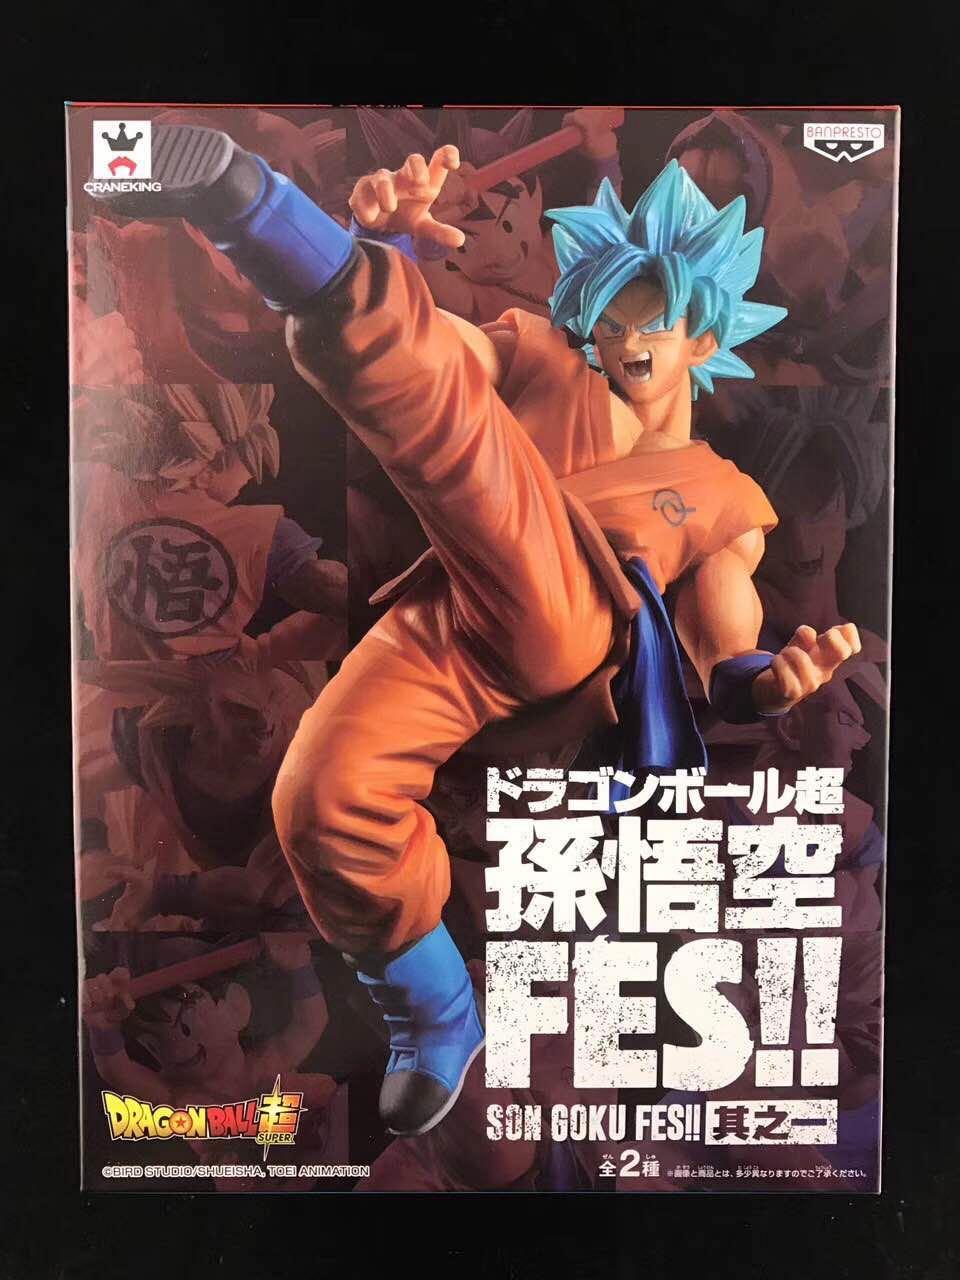 Dragon Ball-Original Banpresto Super Saiyan Son Goku FES Collection Figure Anime Figure original banpresto dxf the super warriors vol 4 collection figure super saiyan vegetto son goku from dragon ball super